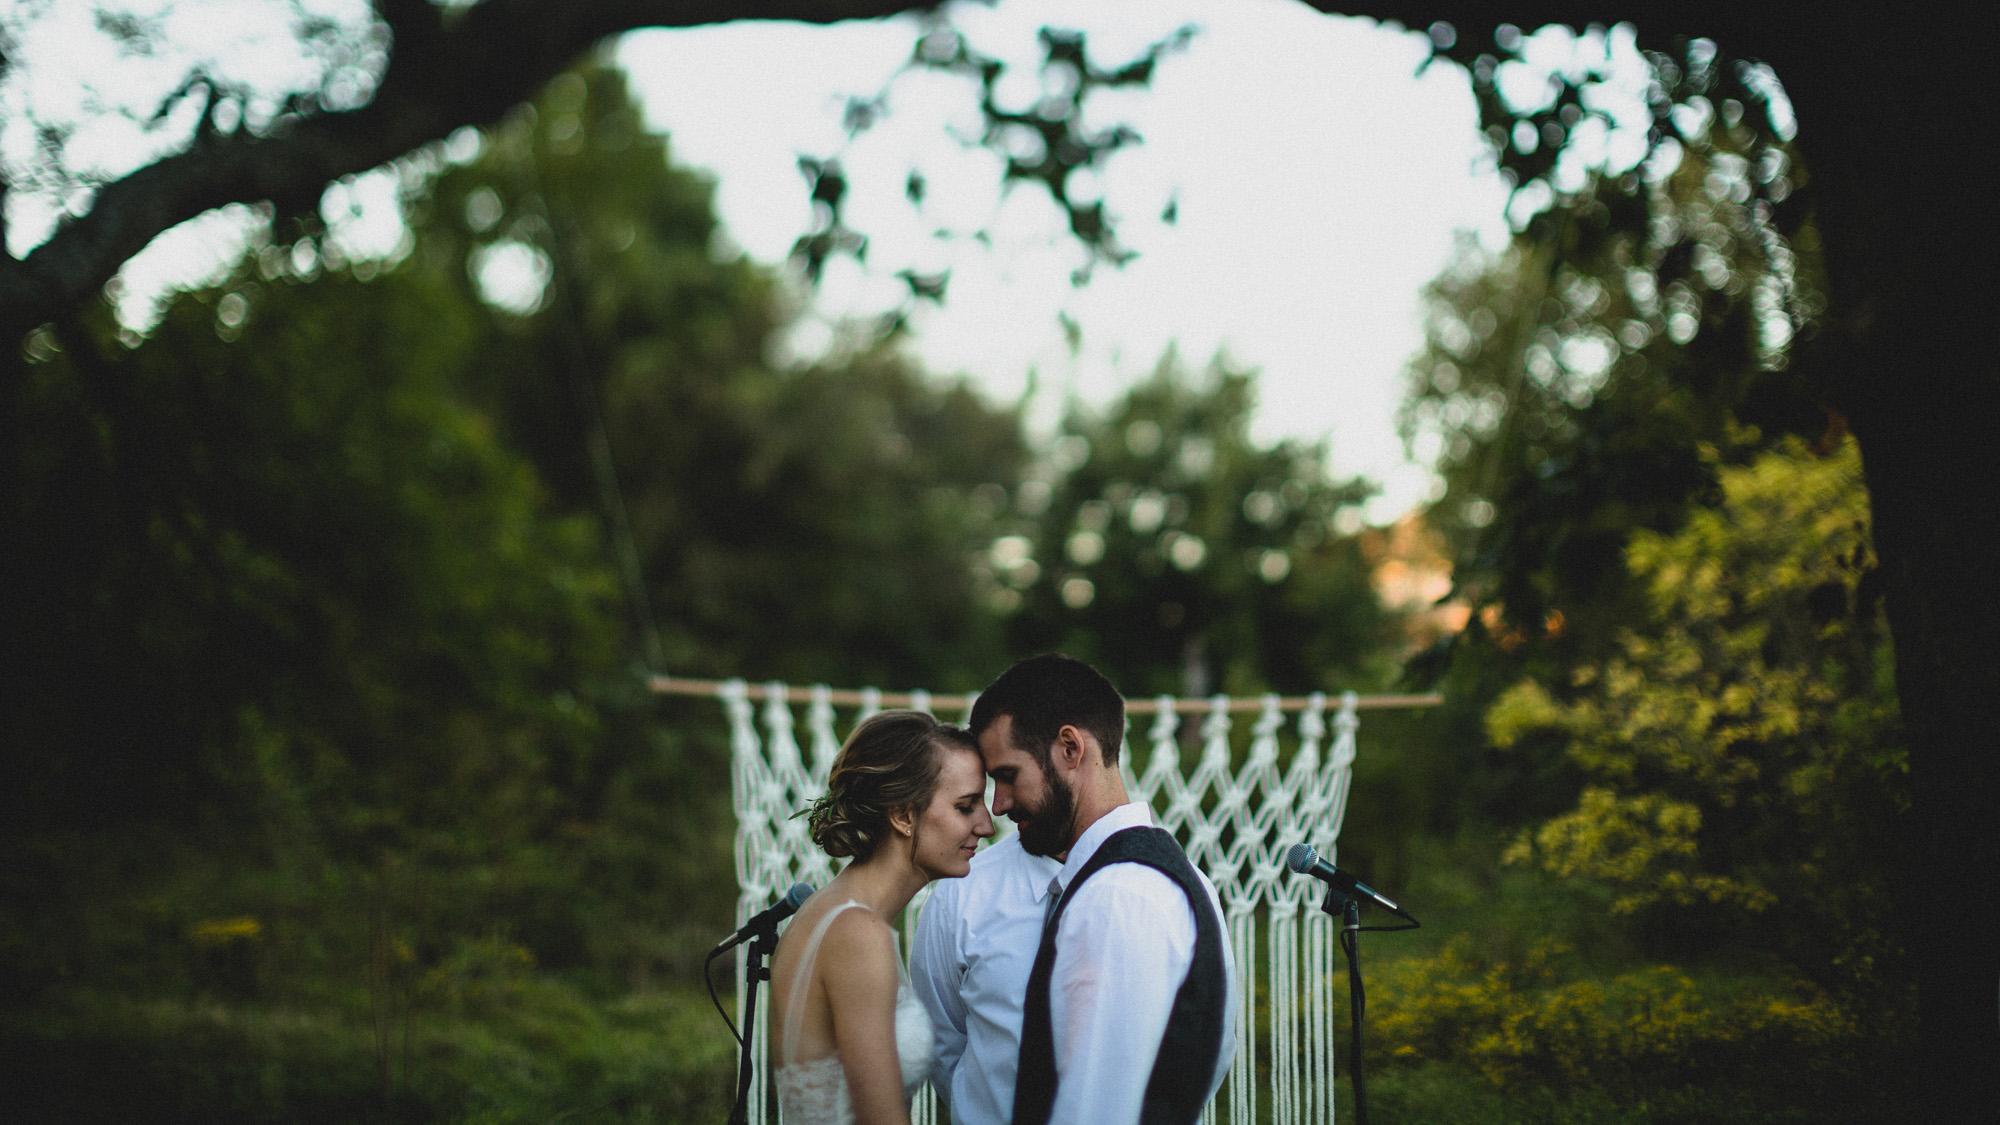 alec_vanderboom_springfield_missouri_wedding-0069.jpg